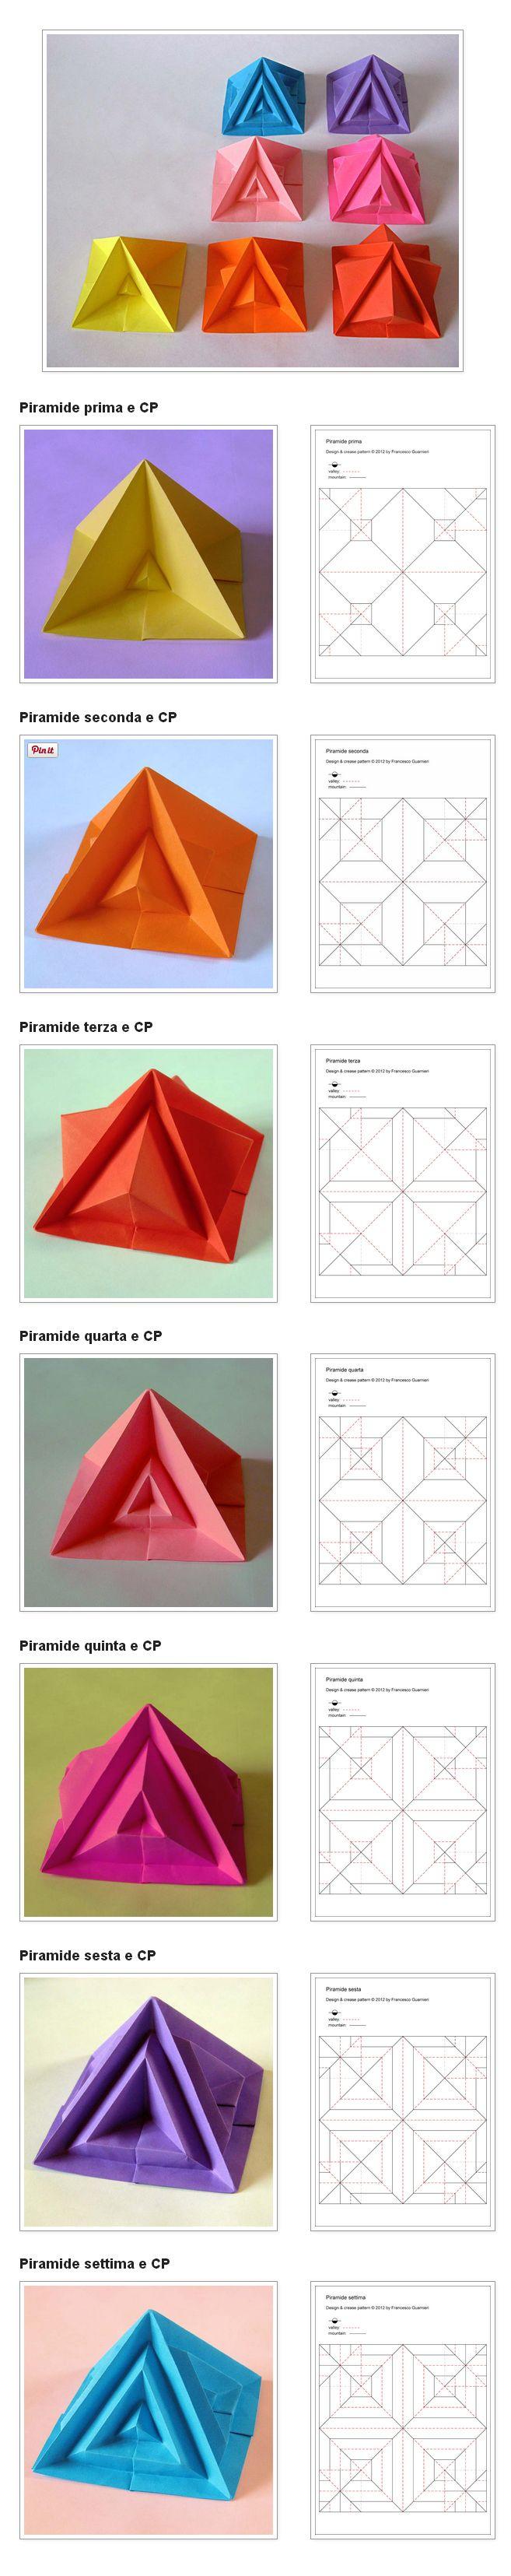 211 Best Images On Pinterest Crafts Napkin Folding And 3d Origami Swan Diagram Http Howtoorigamicom Origamiswanhtml Piramide Settima E Varianti Seventh Pyramid Variants By Francesco Guarnieri